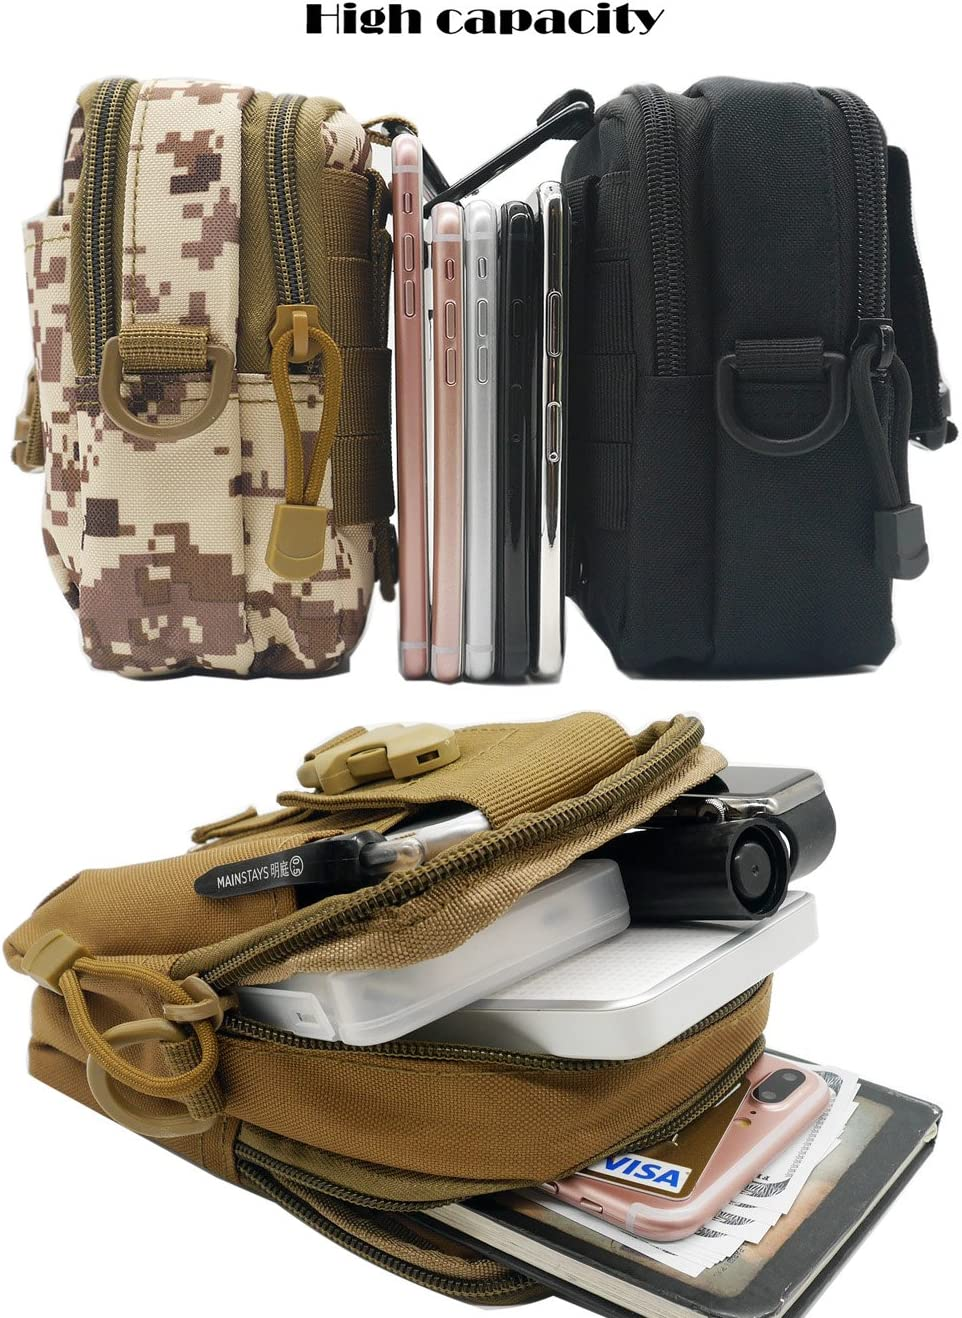 Bolsa EDC (Everyday Carry)